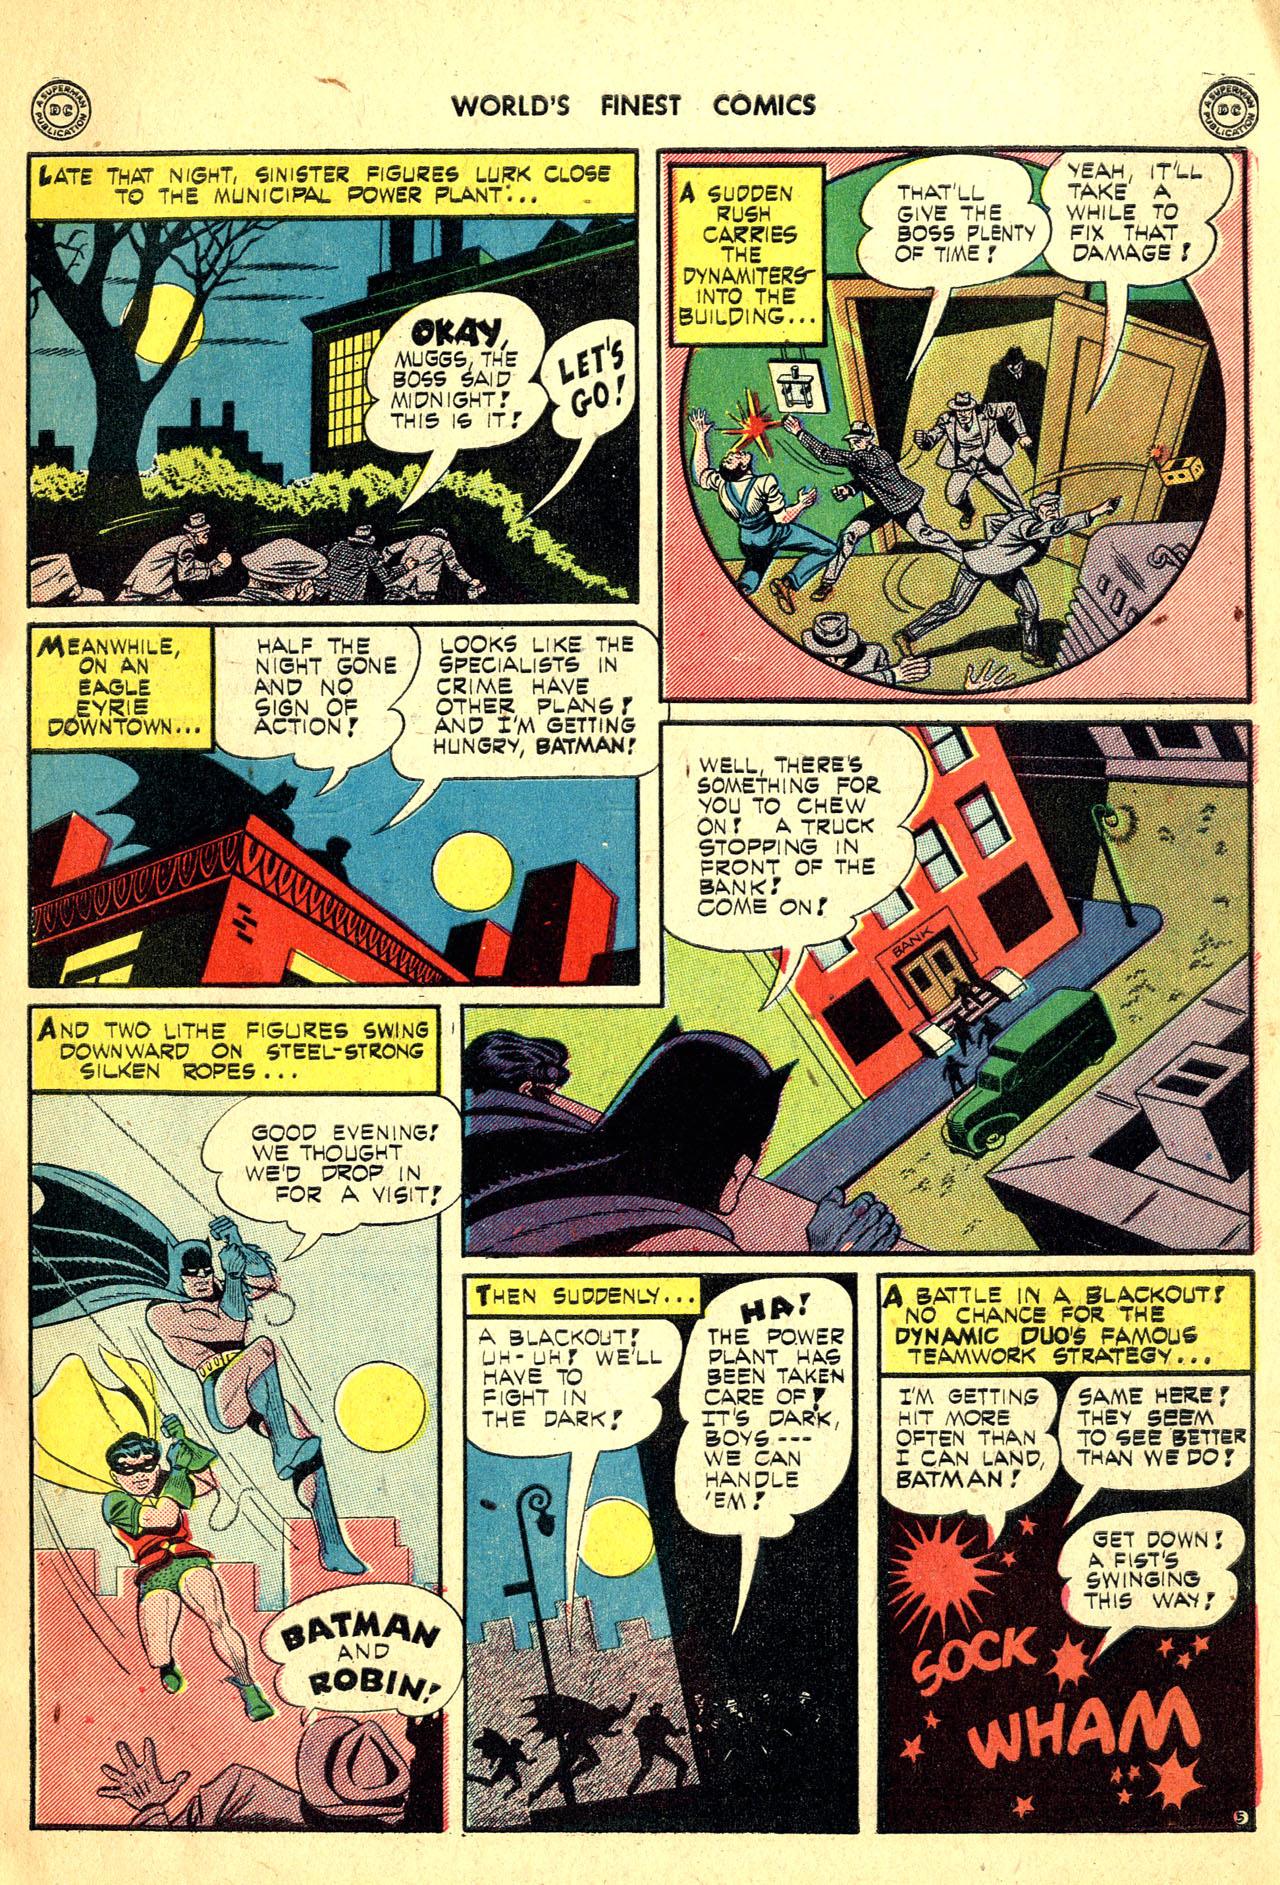 Read online World's Finest Comics comic -  Issue #18 - 73